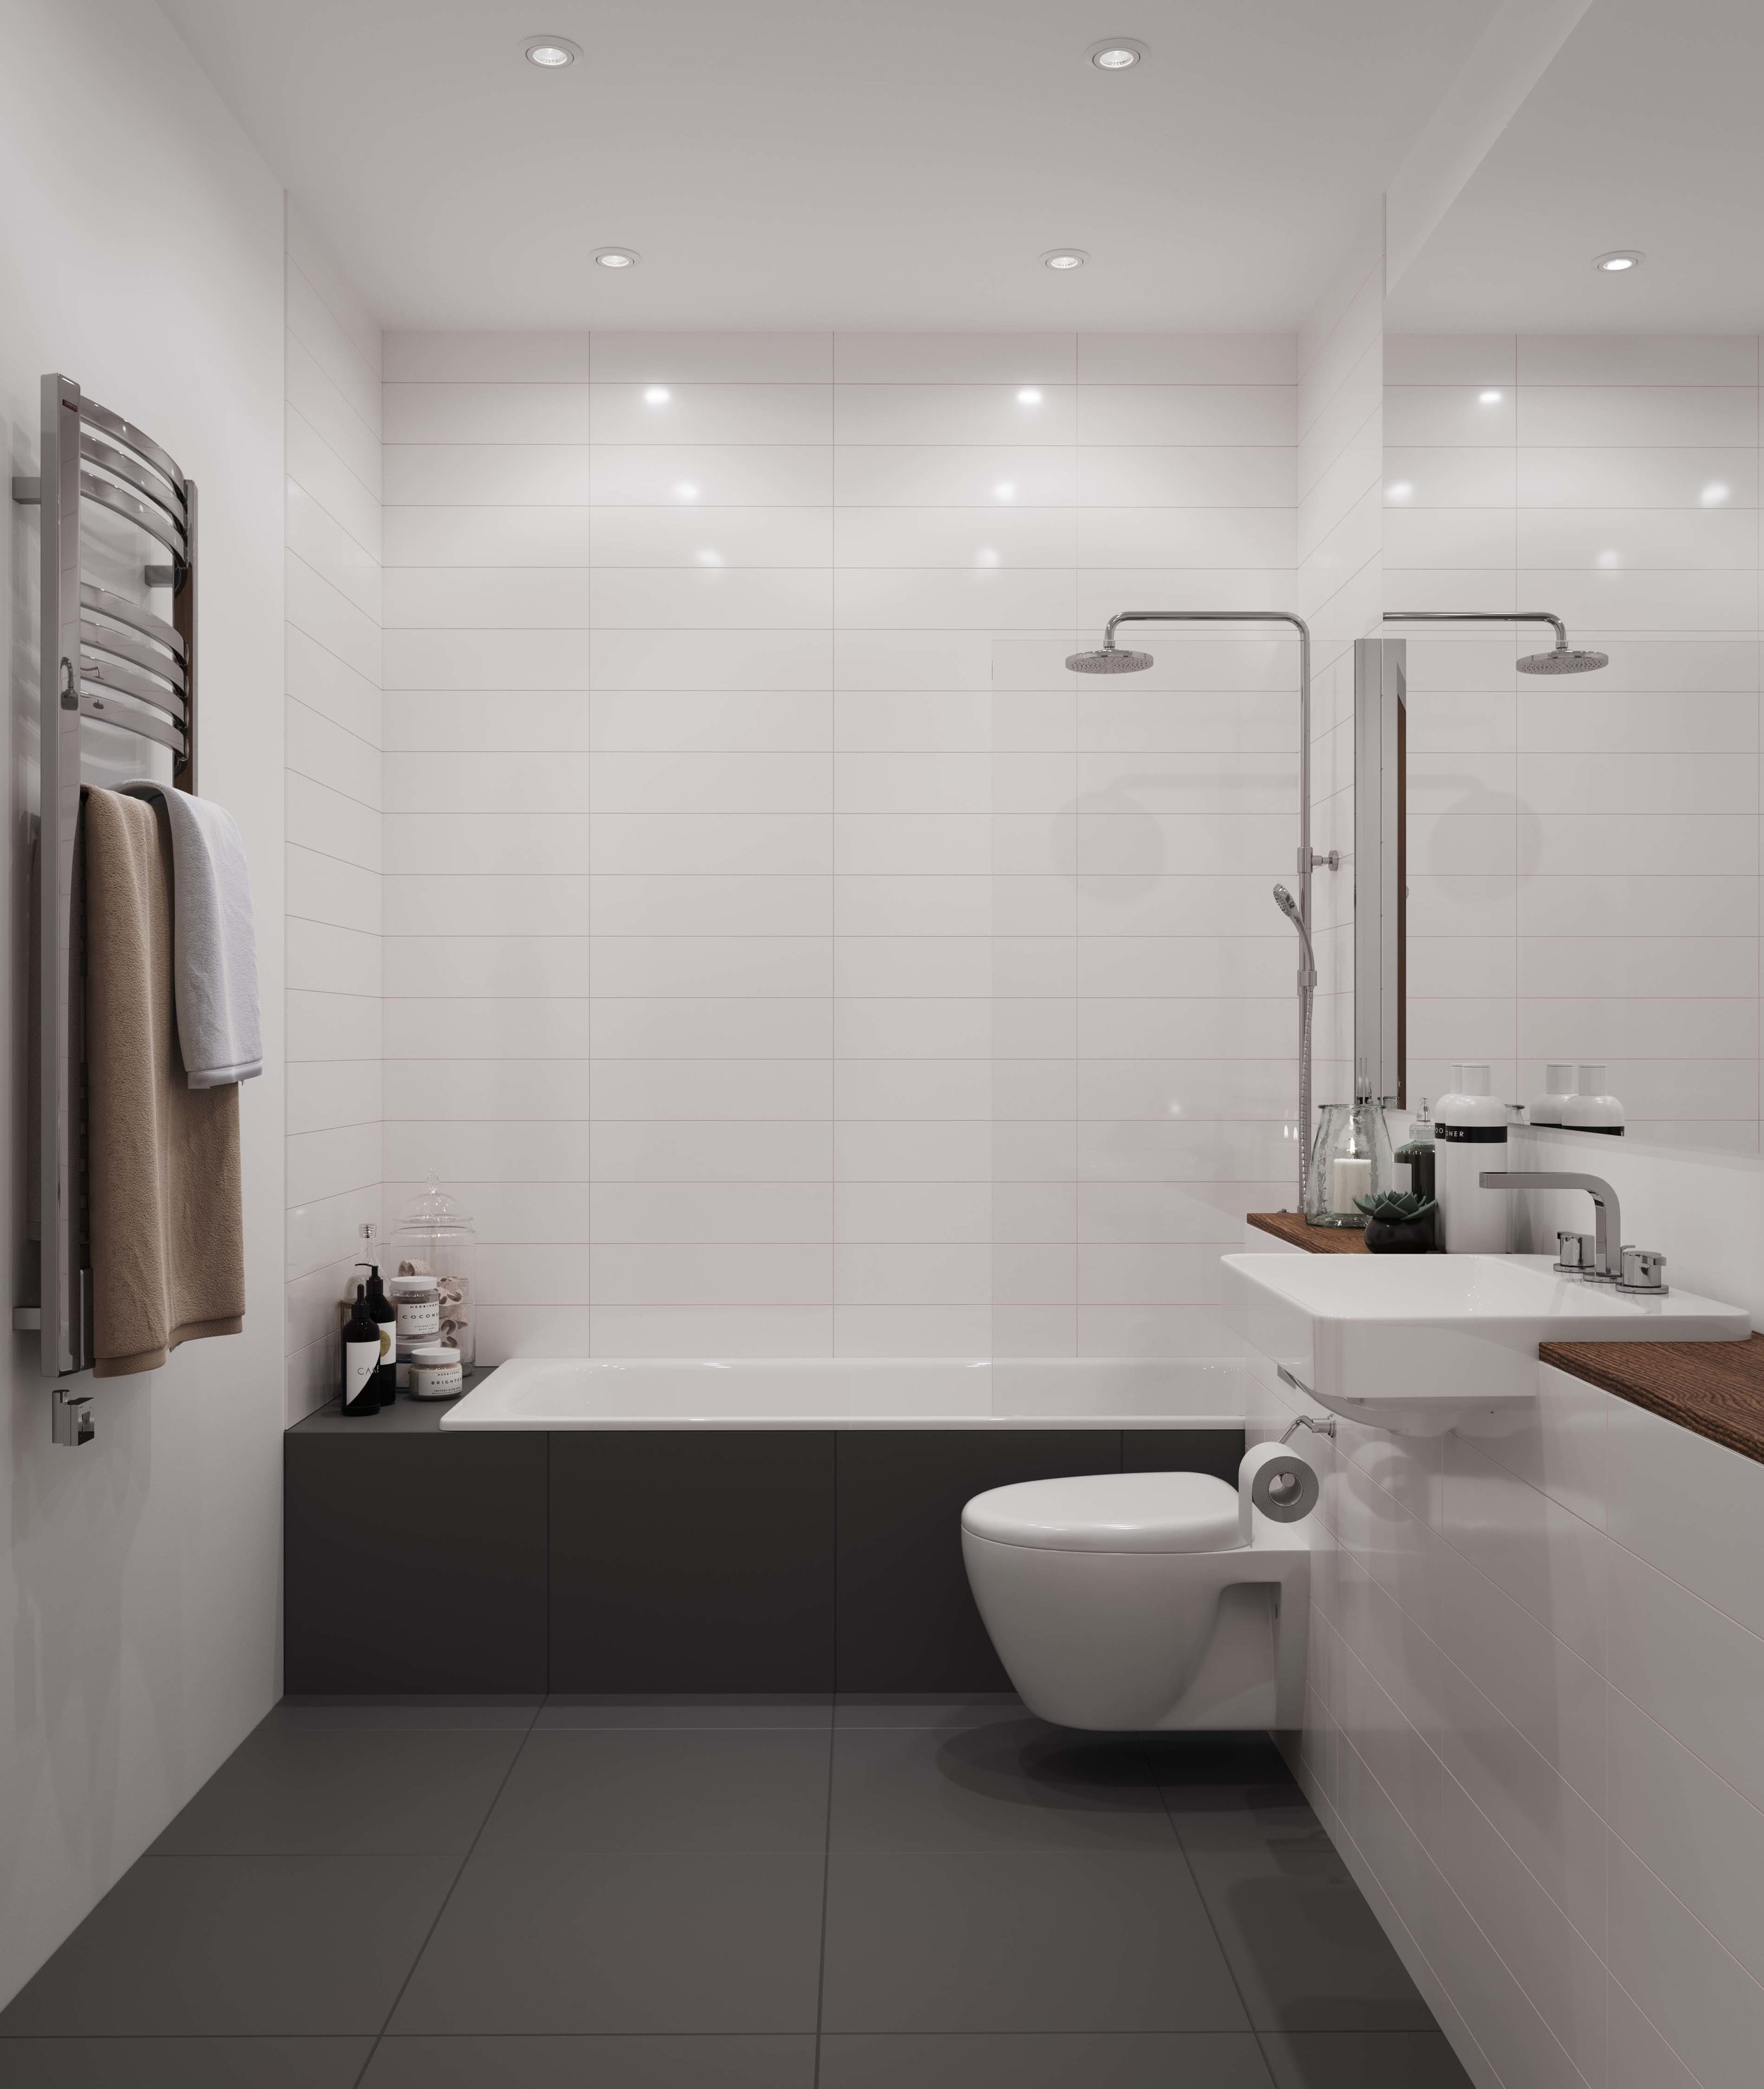 Family Bathroom - CG Visualisation.jpg